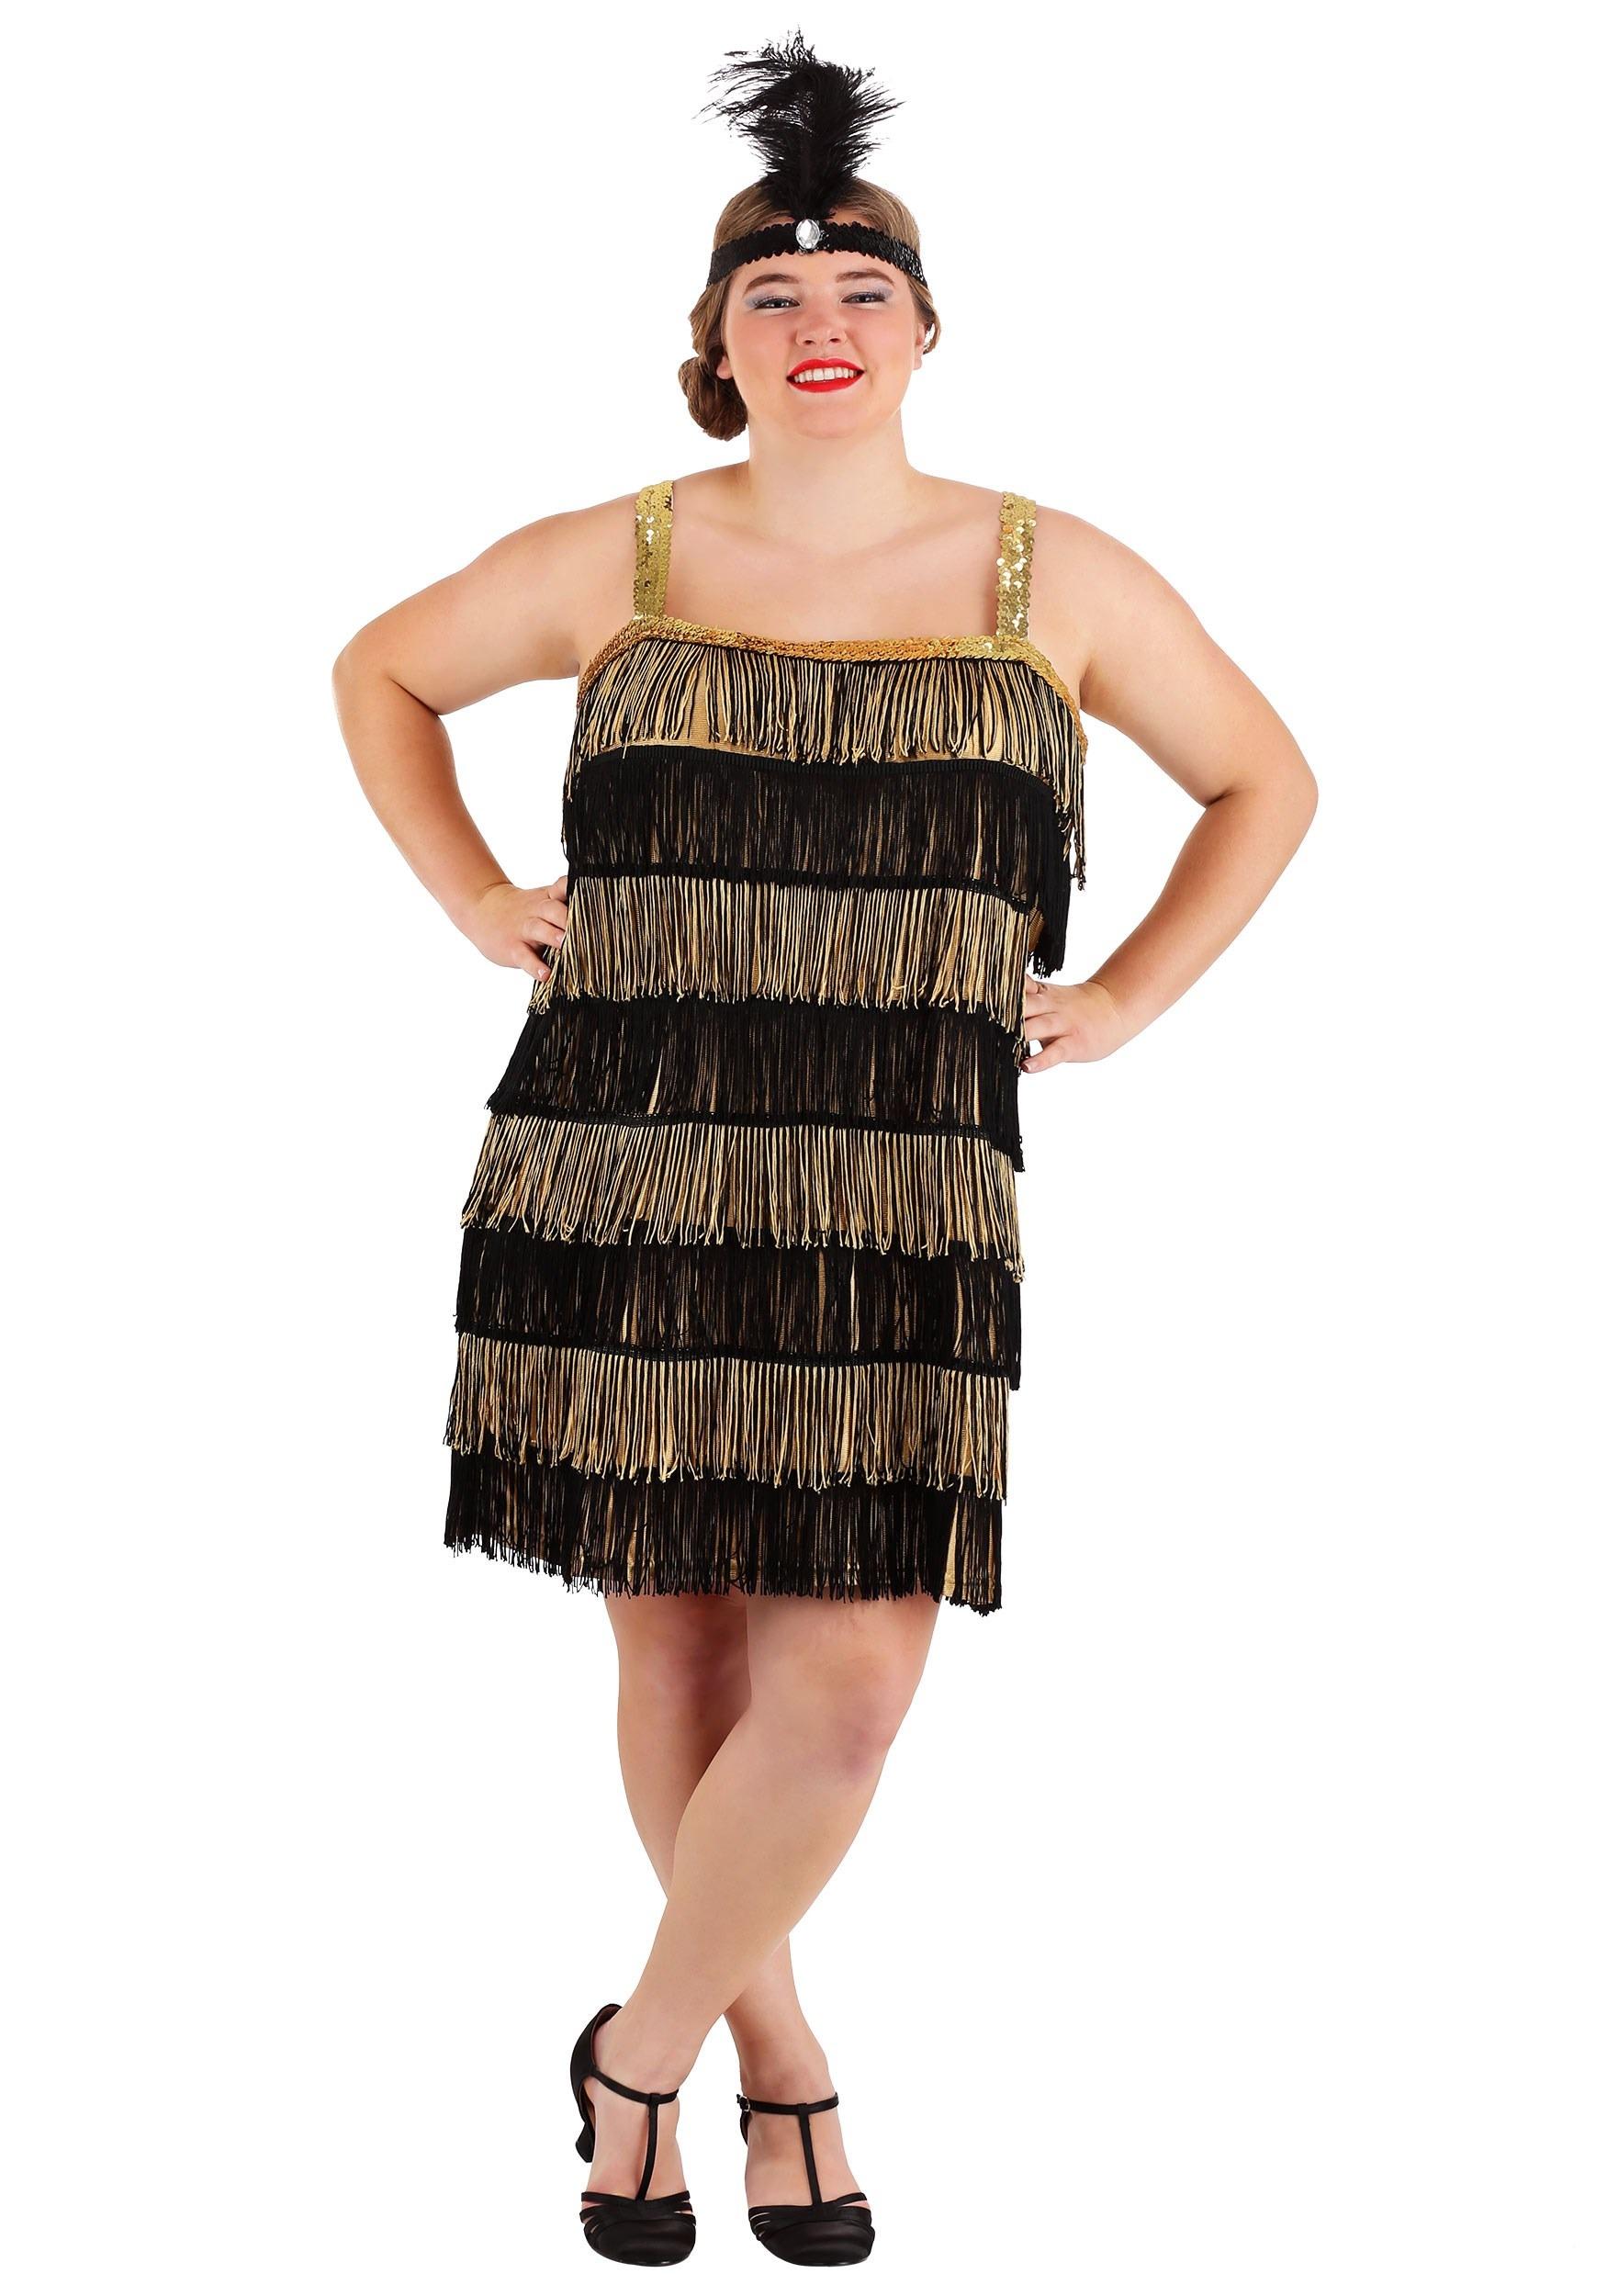 Women's Plus Size Fringe Gold Flapper Costume